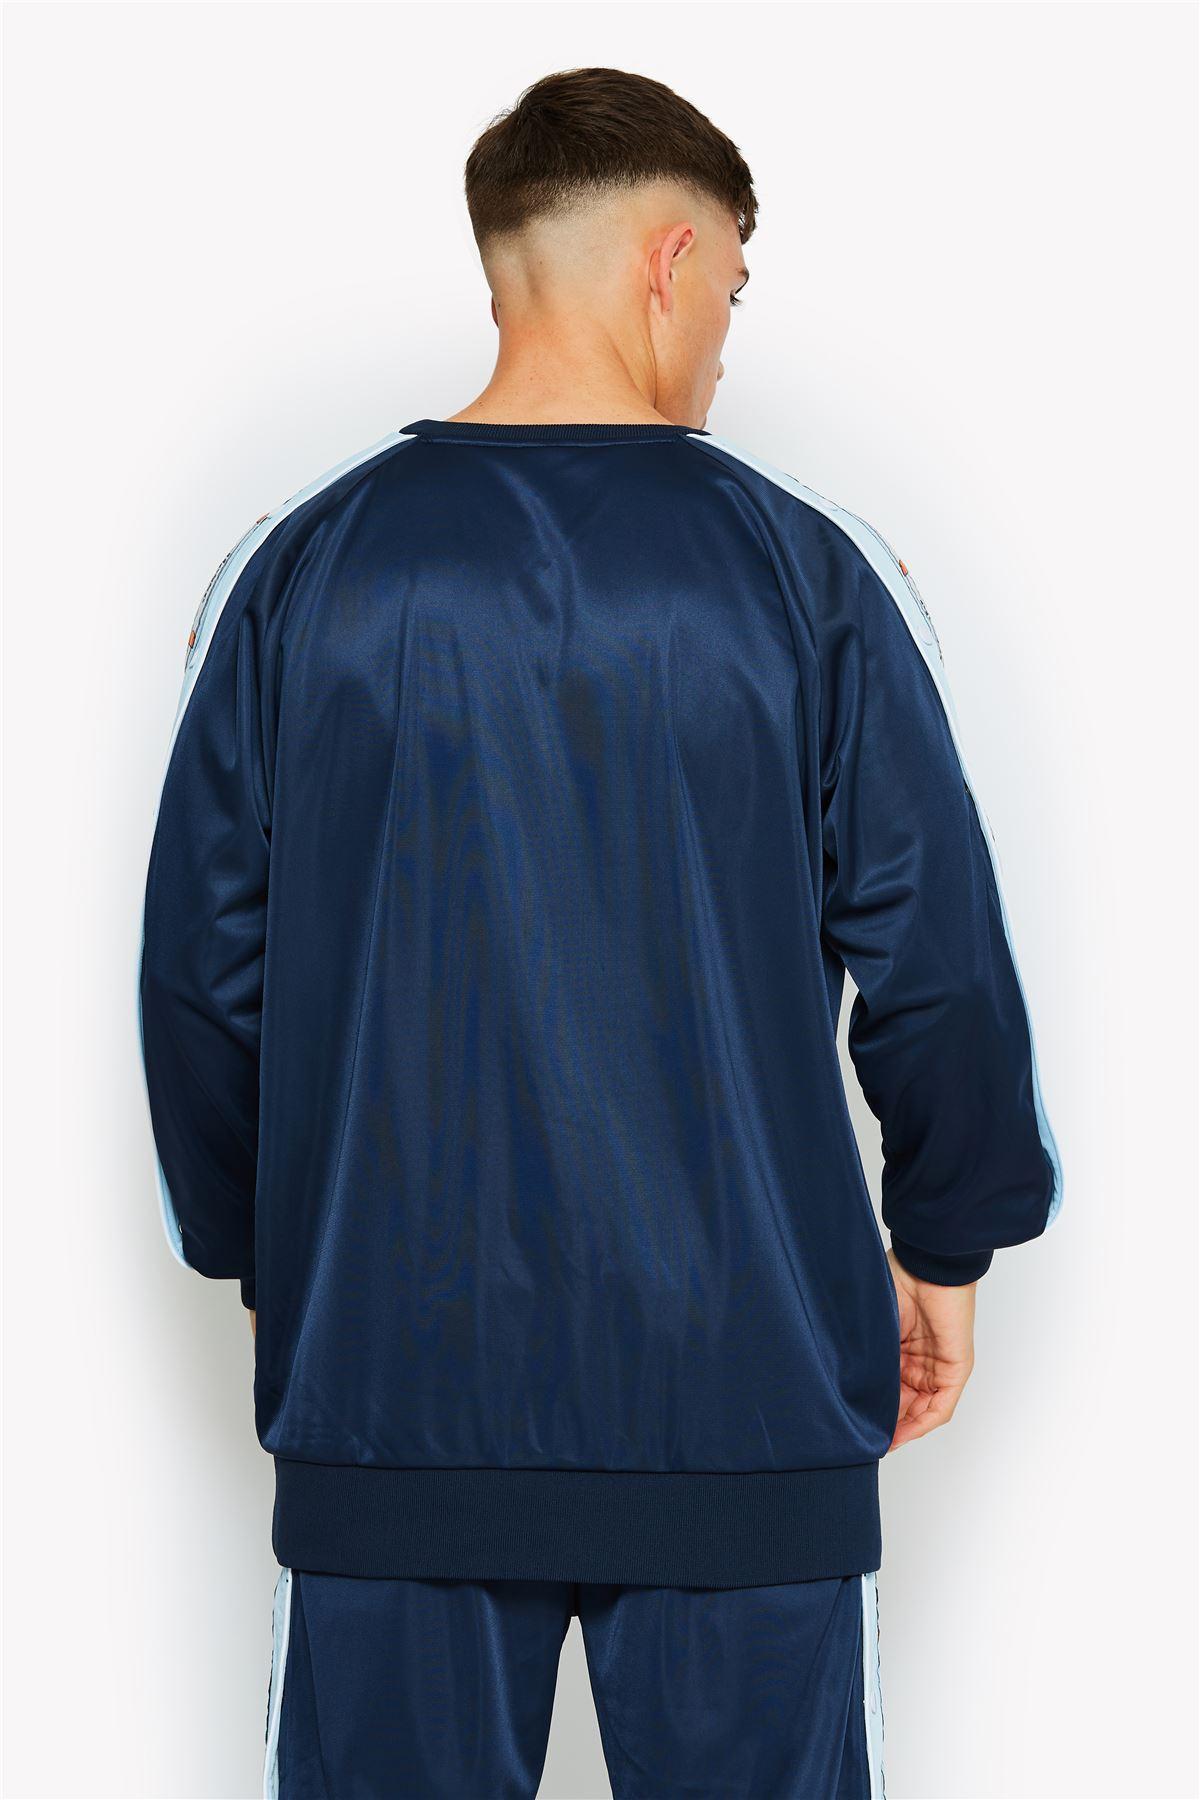 Ellesse-Trainingsanzug-Crew-Hals-Retro-Pullover-Top-amp-Trainingshose-Einzel-Dinge Indexbild 9